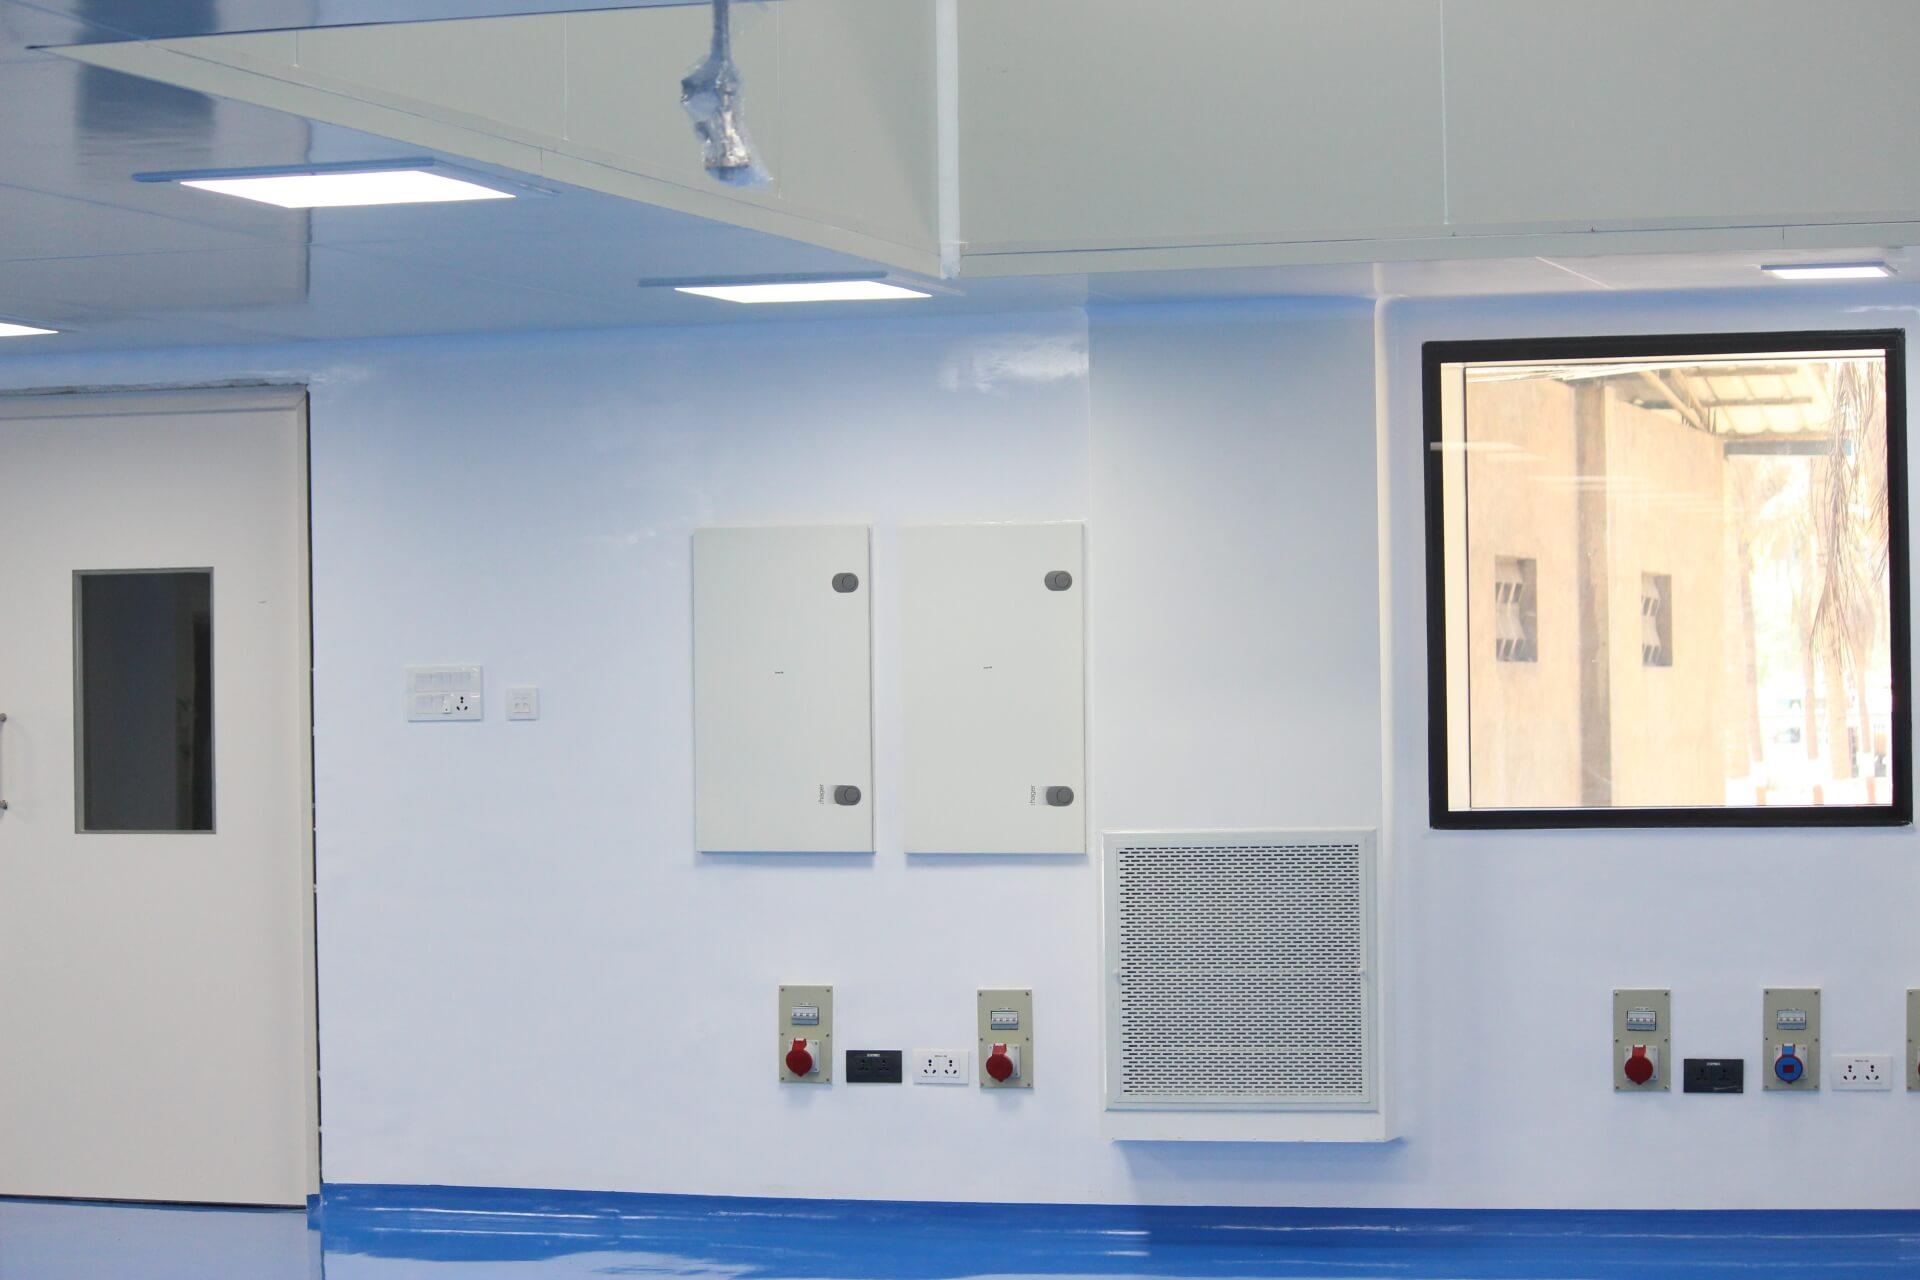 modular+ceiling+window